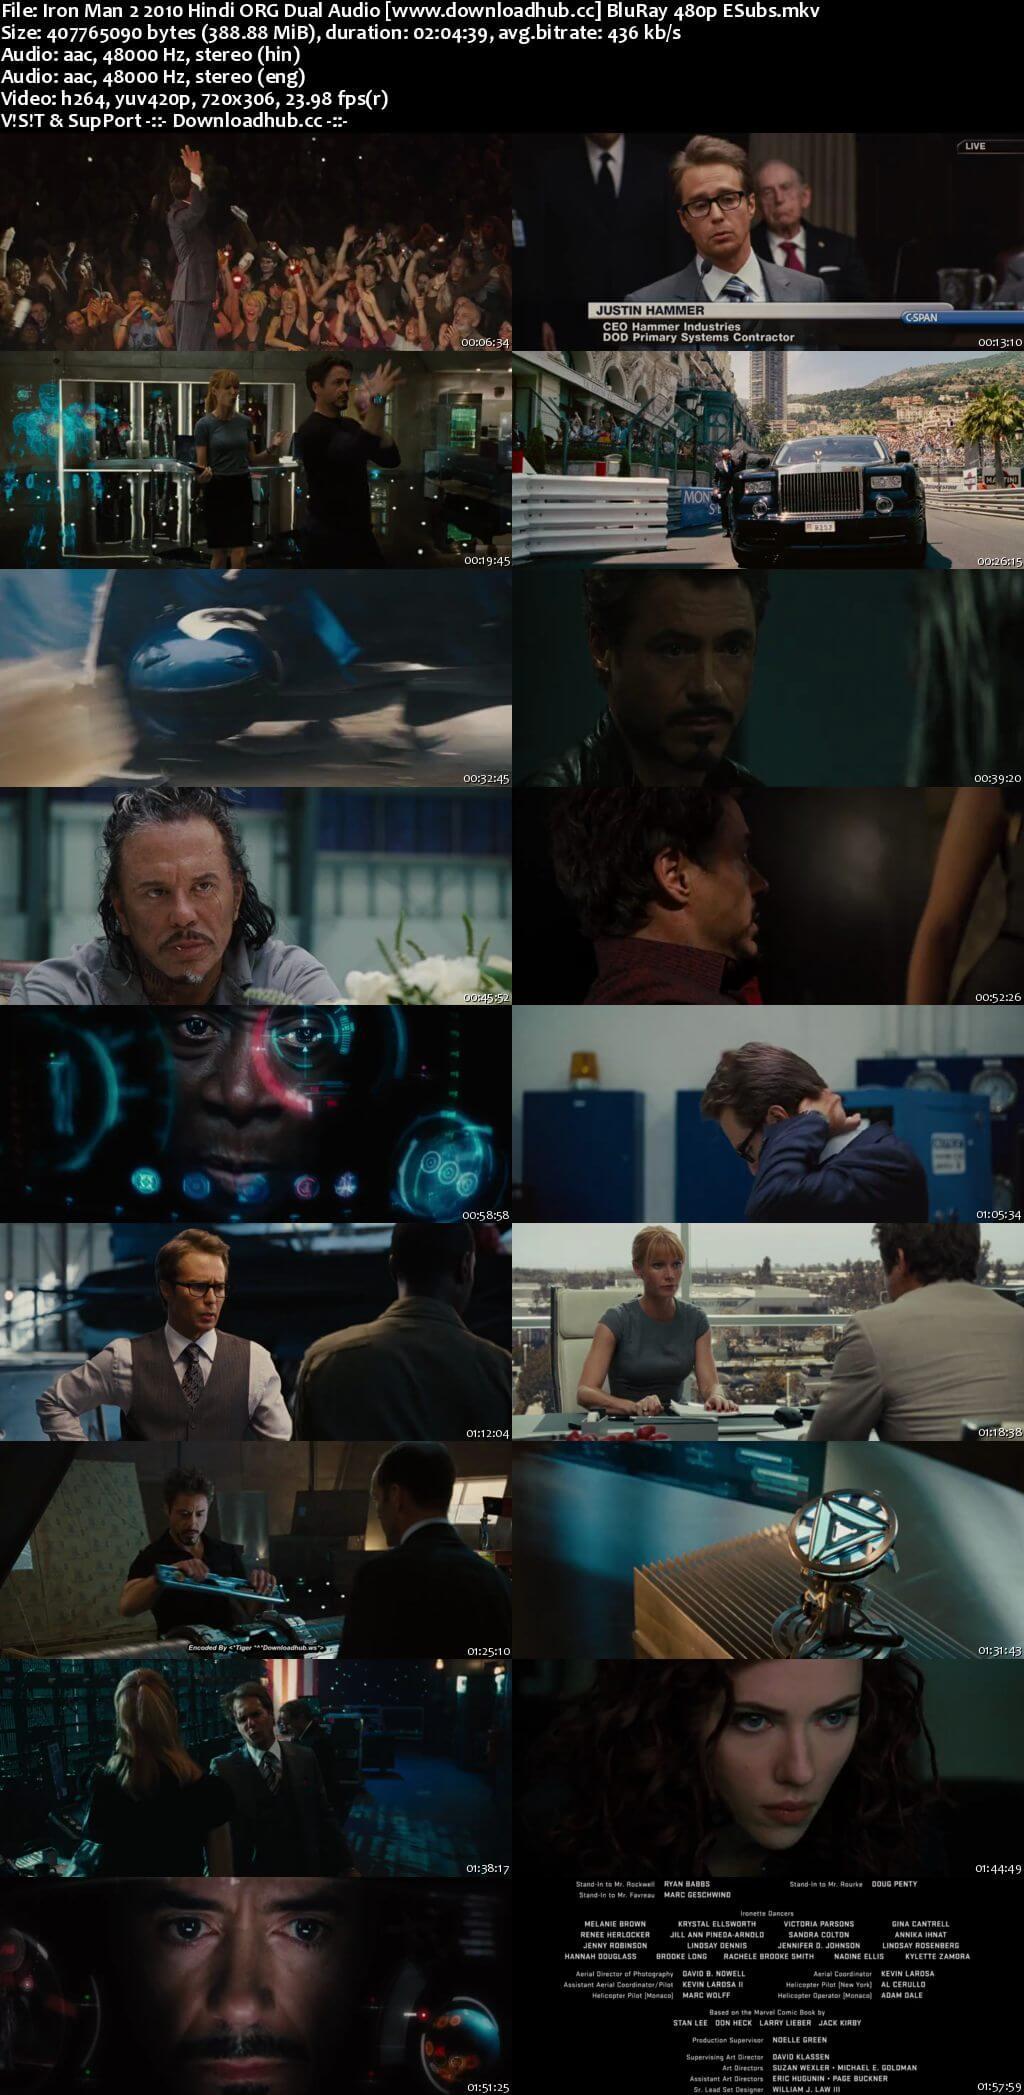 Iron Man 2 2010 Hindi ORG Dual Audio 400MB BluRay 480p ESubs